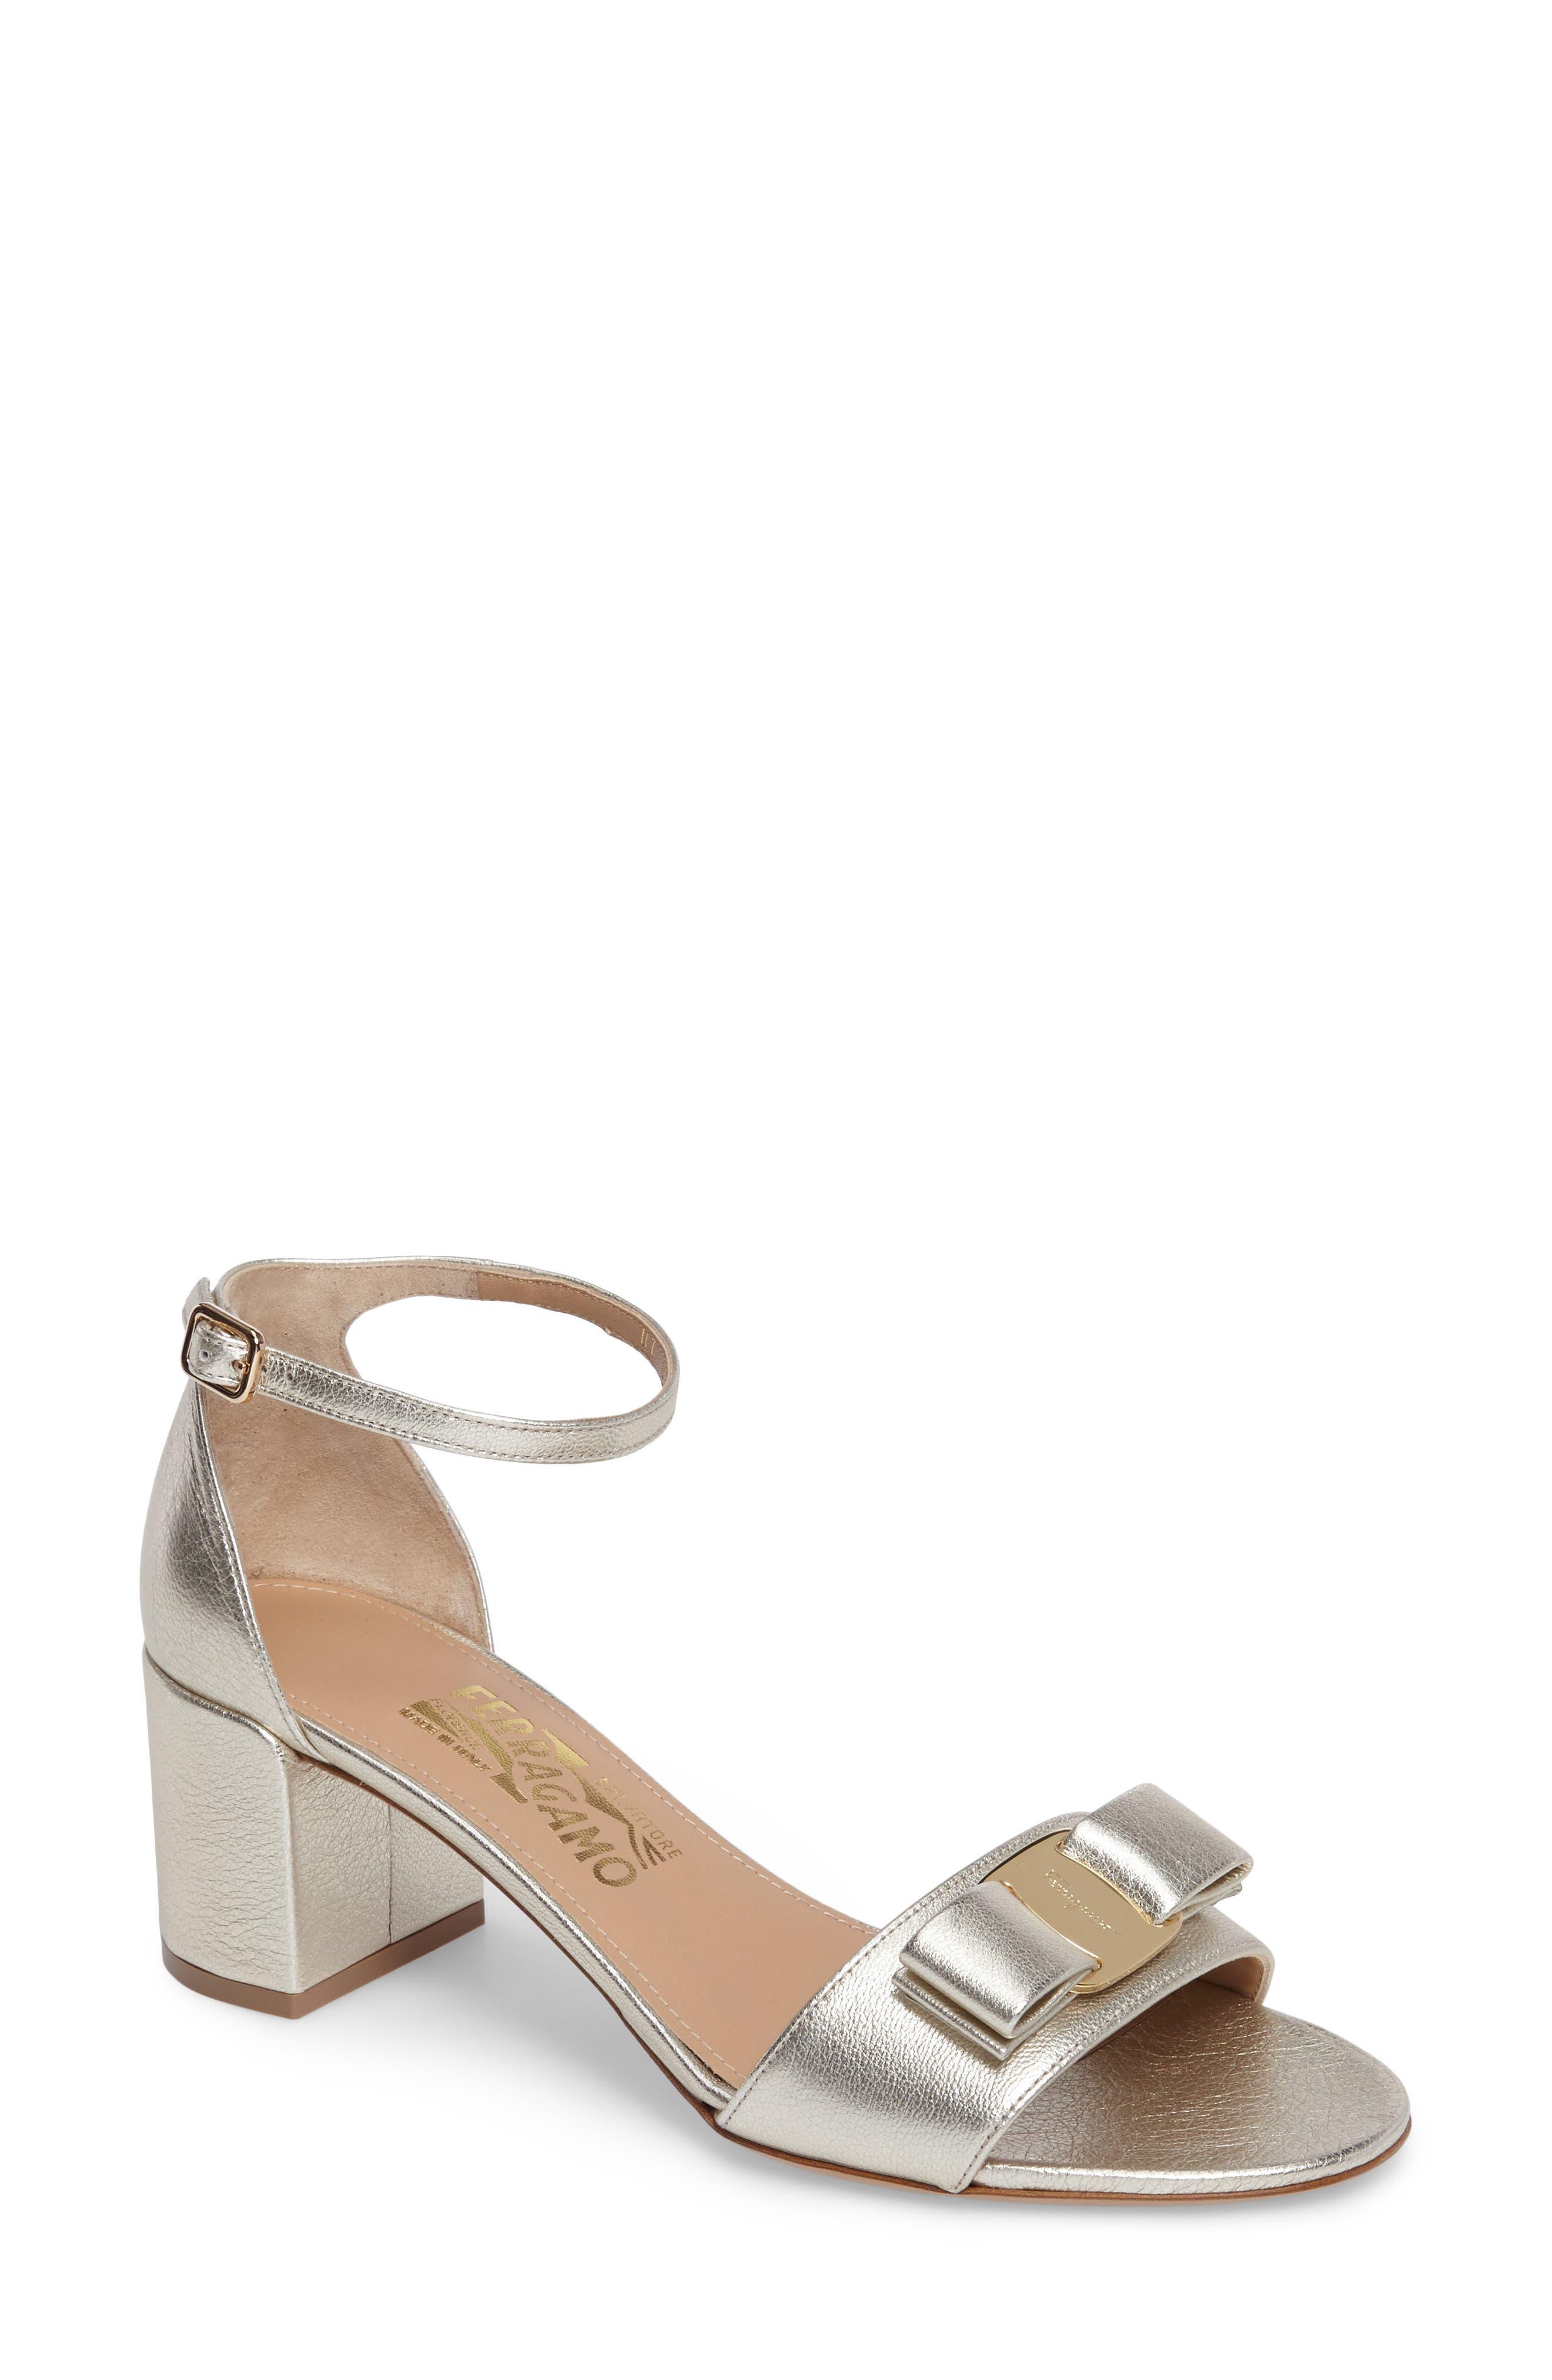 Gavina Metallic Leather Ankle Strap Sandal from Gilt